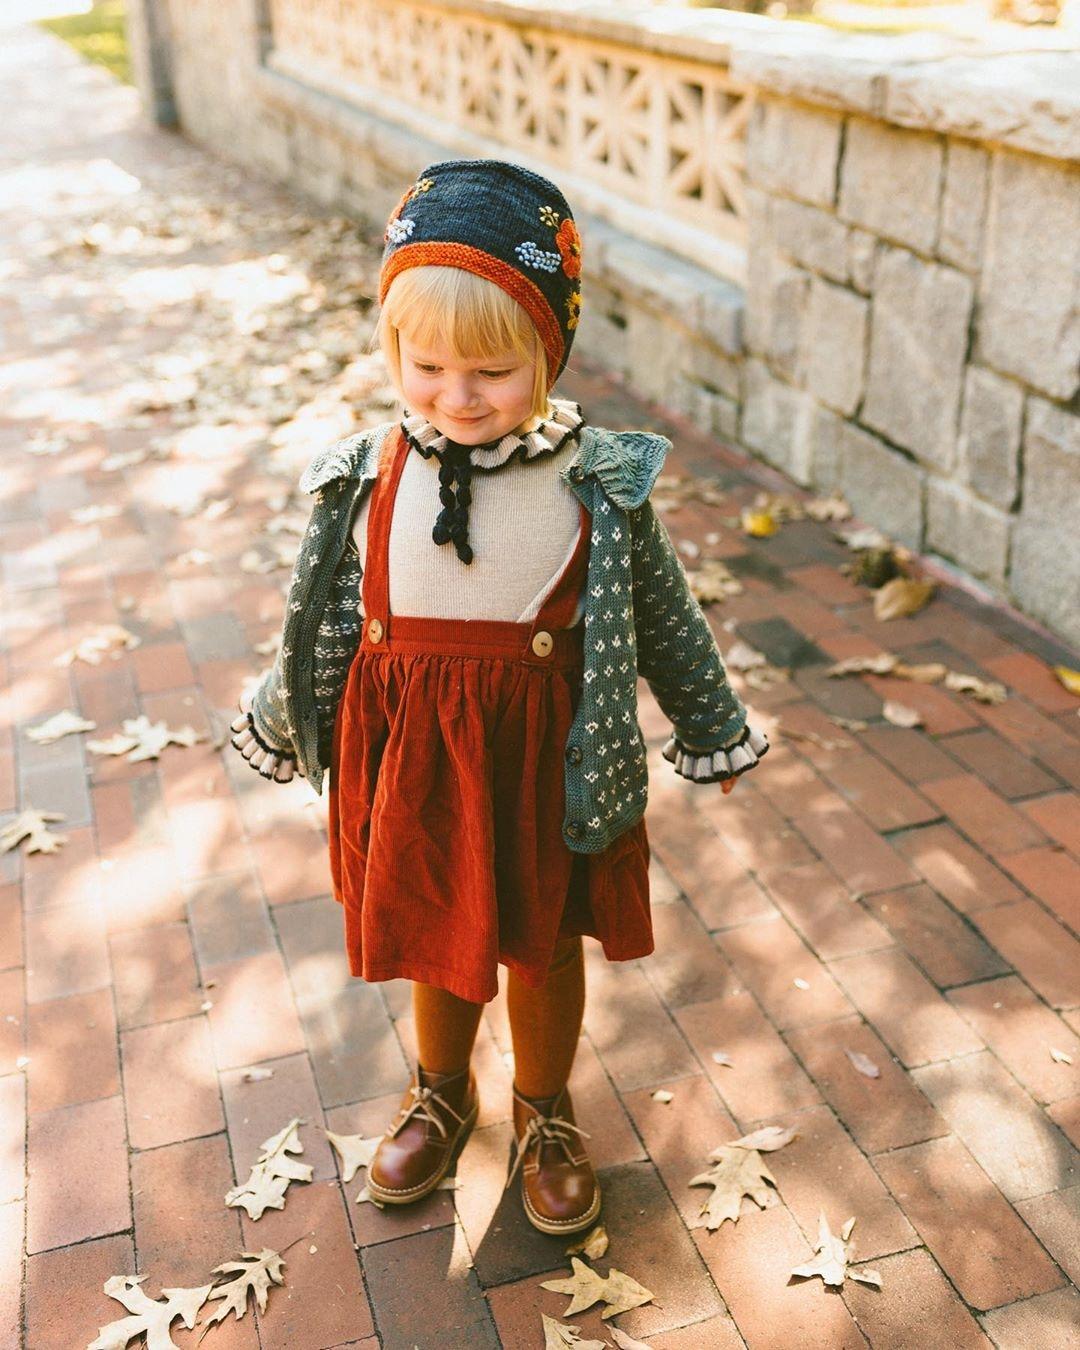 New Winter Kalinka Kids Clothes Girls Sweater Baby Bloom Neck Fashion Knit Cardigan Children Cotton Wool Tops Boys Clothing 4